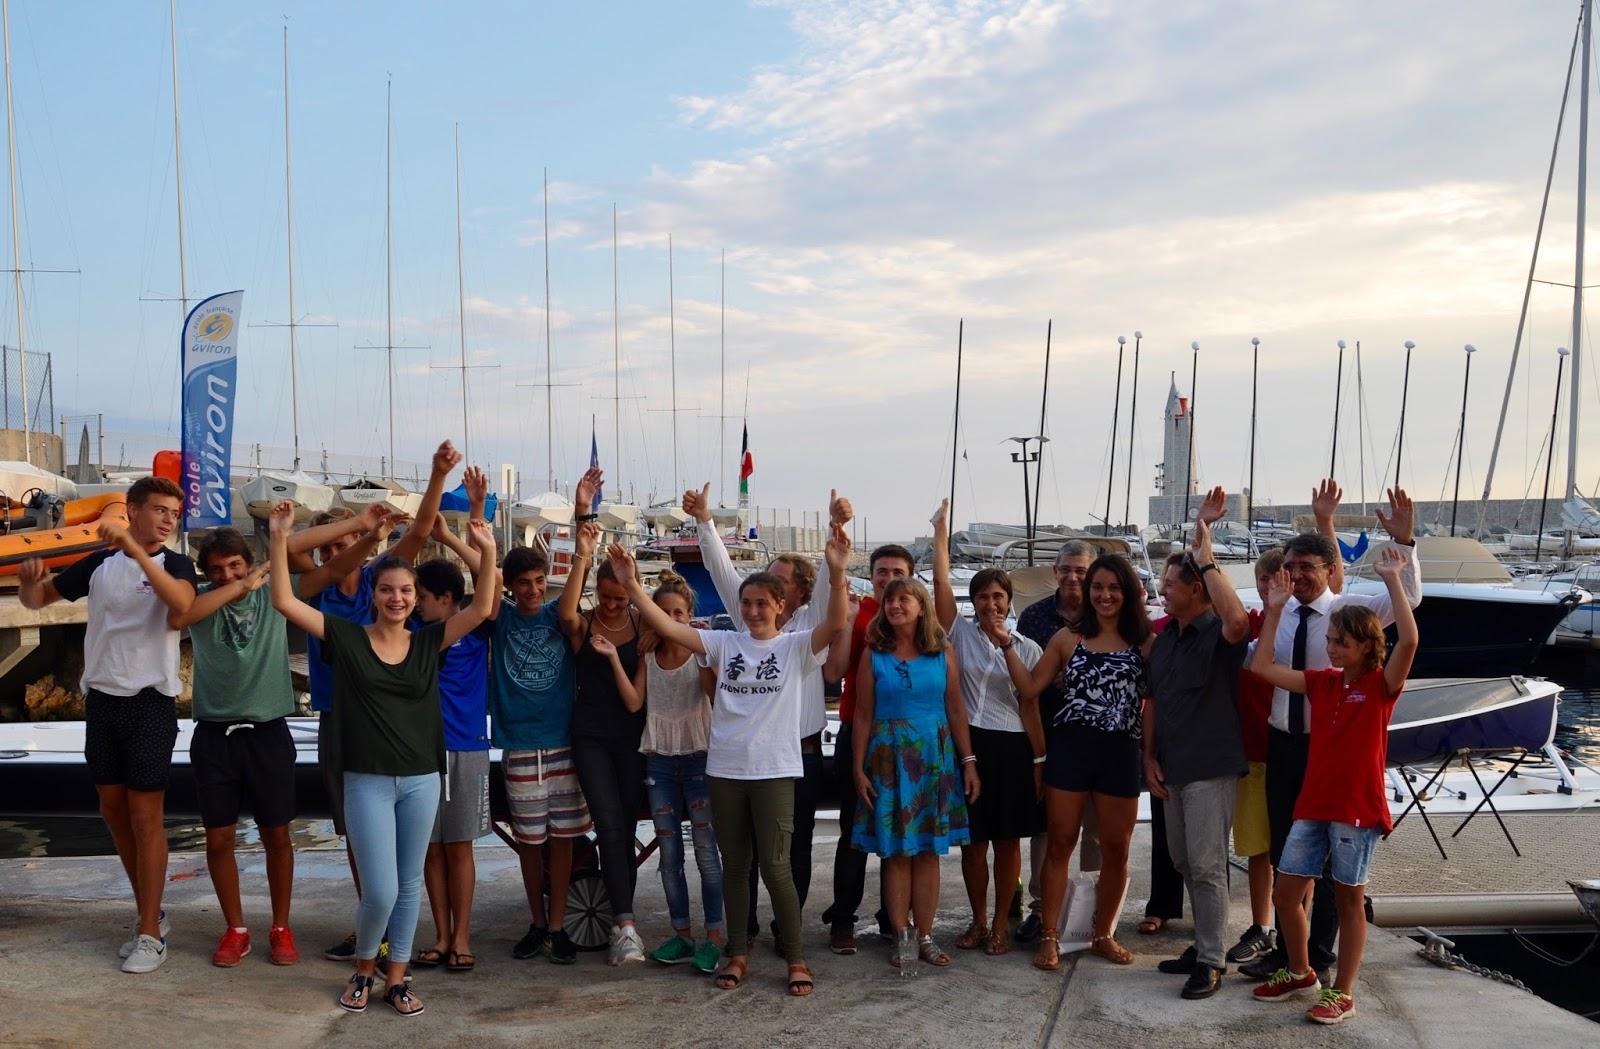 Club Nautique De Nice azurevents06: club nautique de nice - 31 08 2016 - elodie